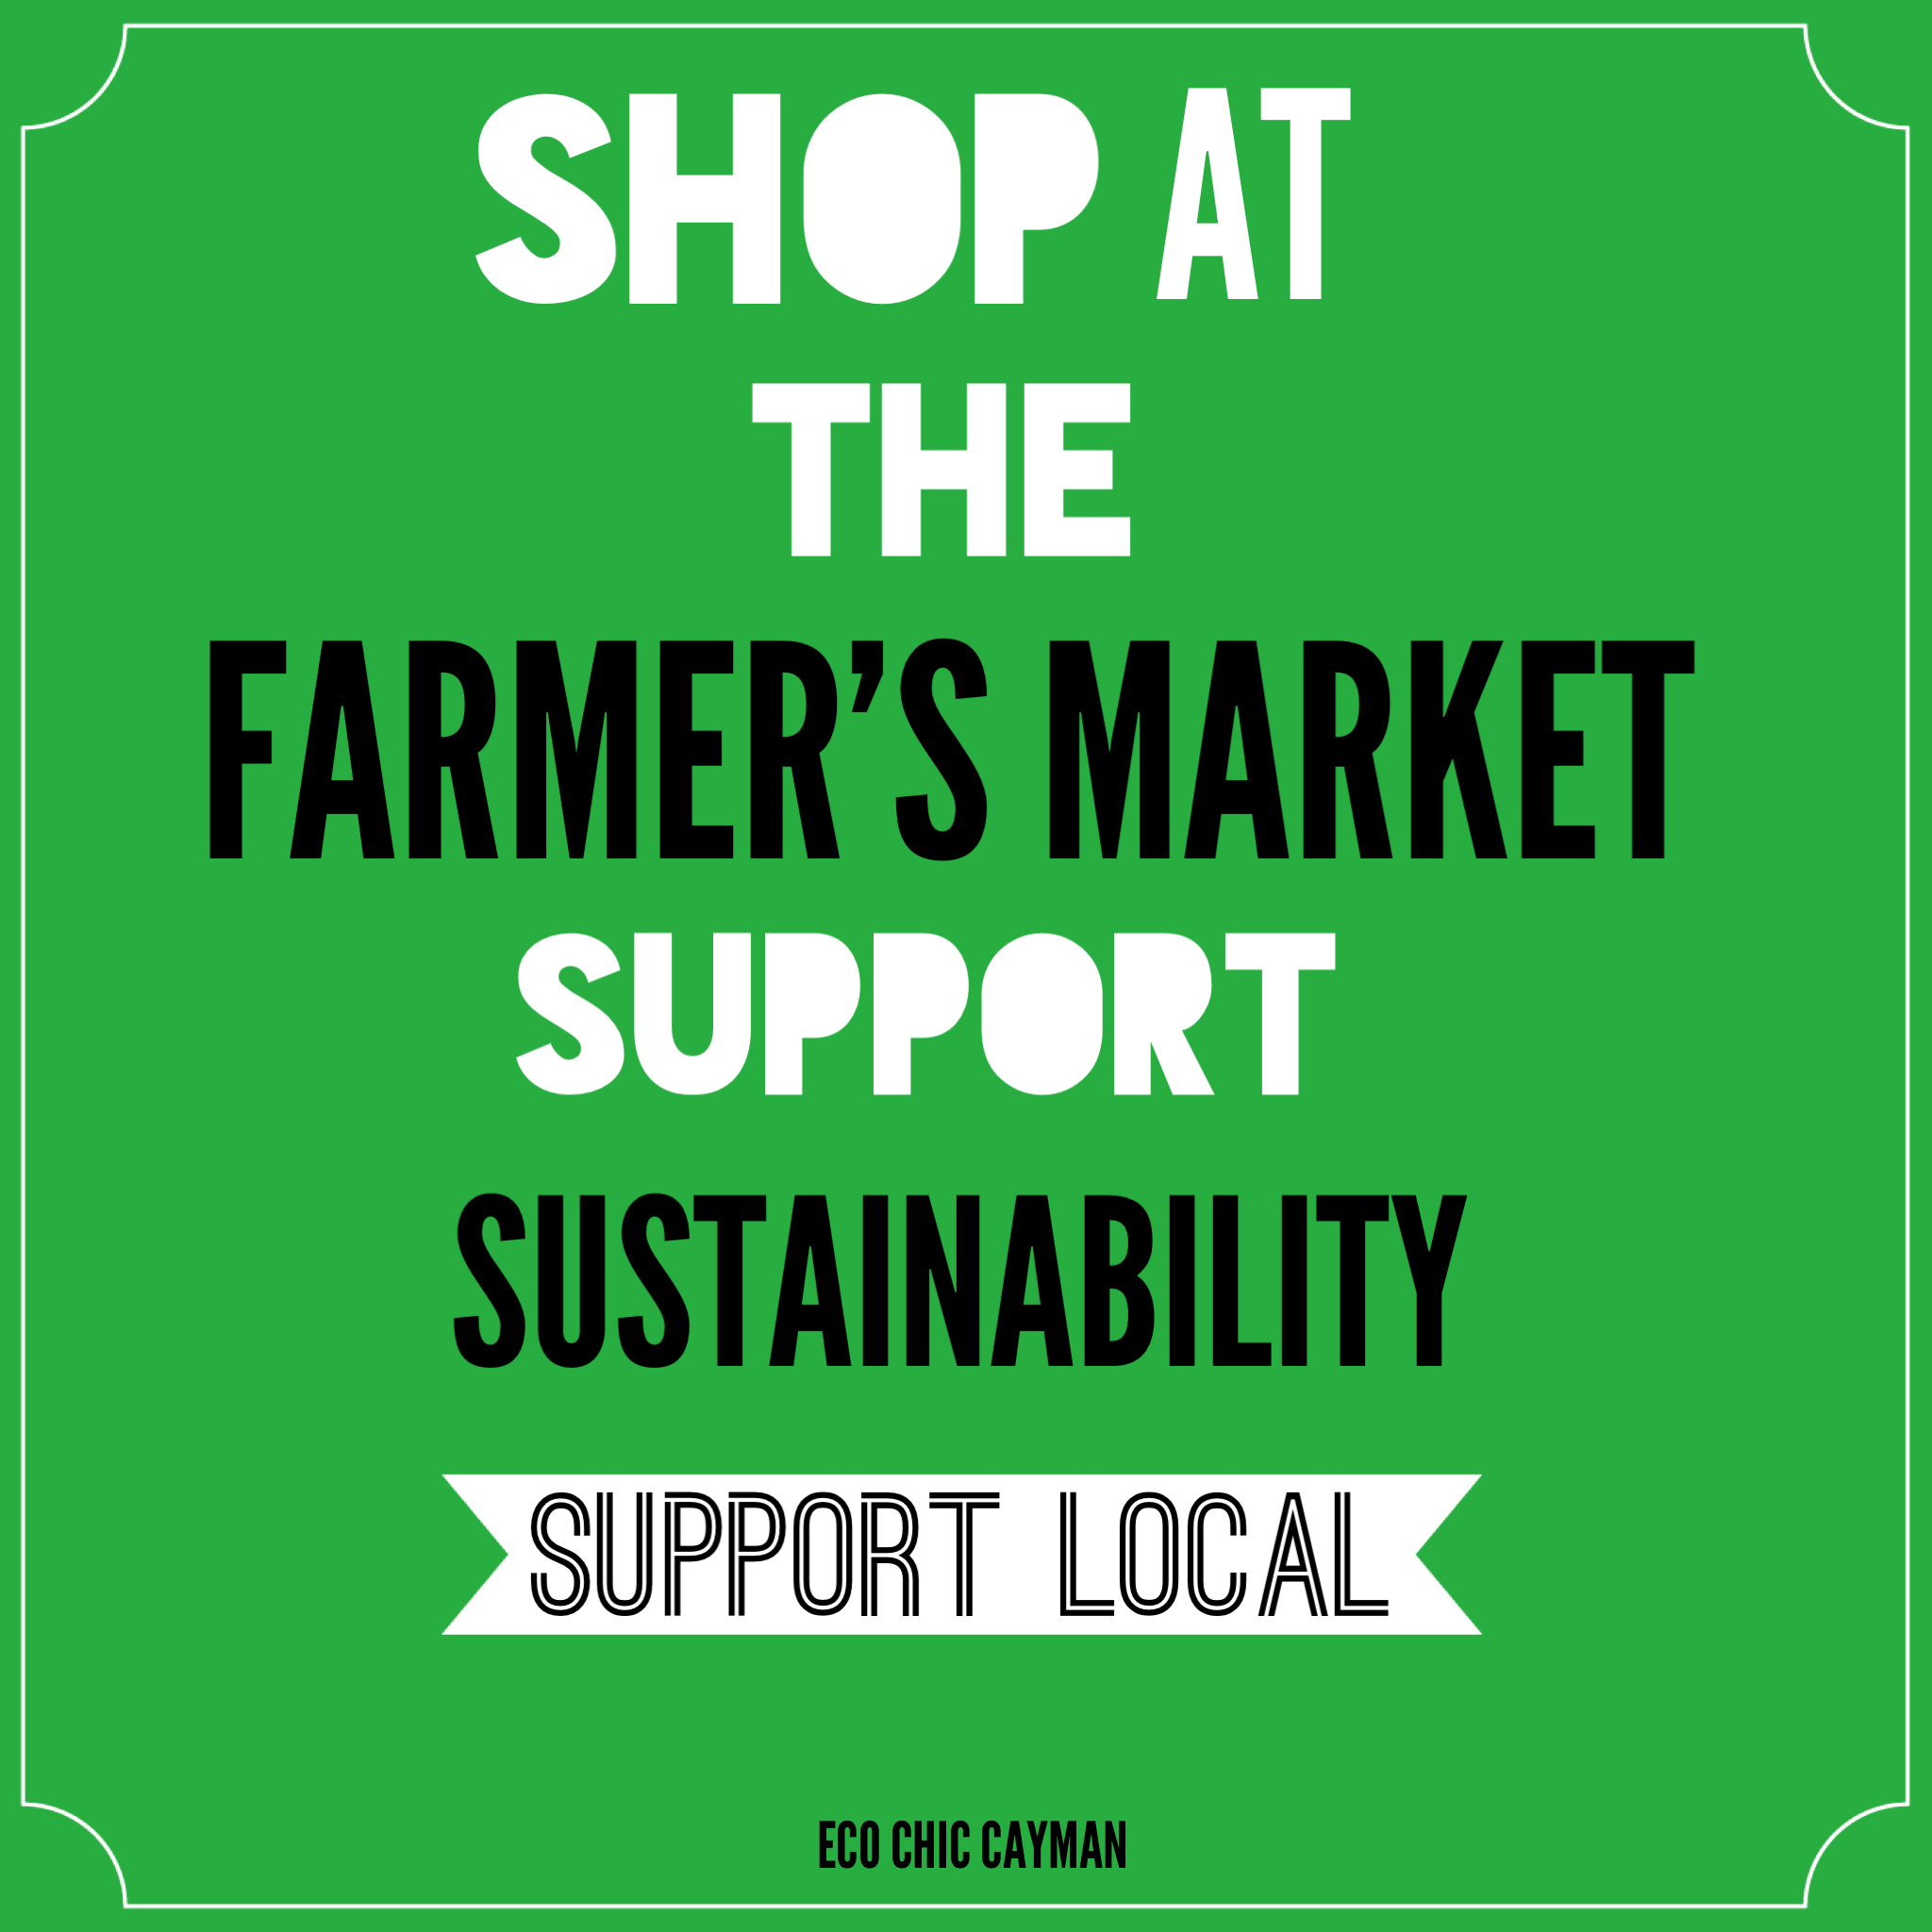 Sustainable Farmers Markets Farmers Market ad